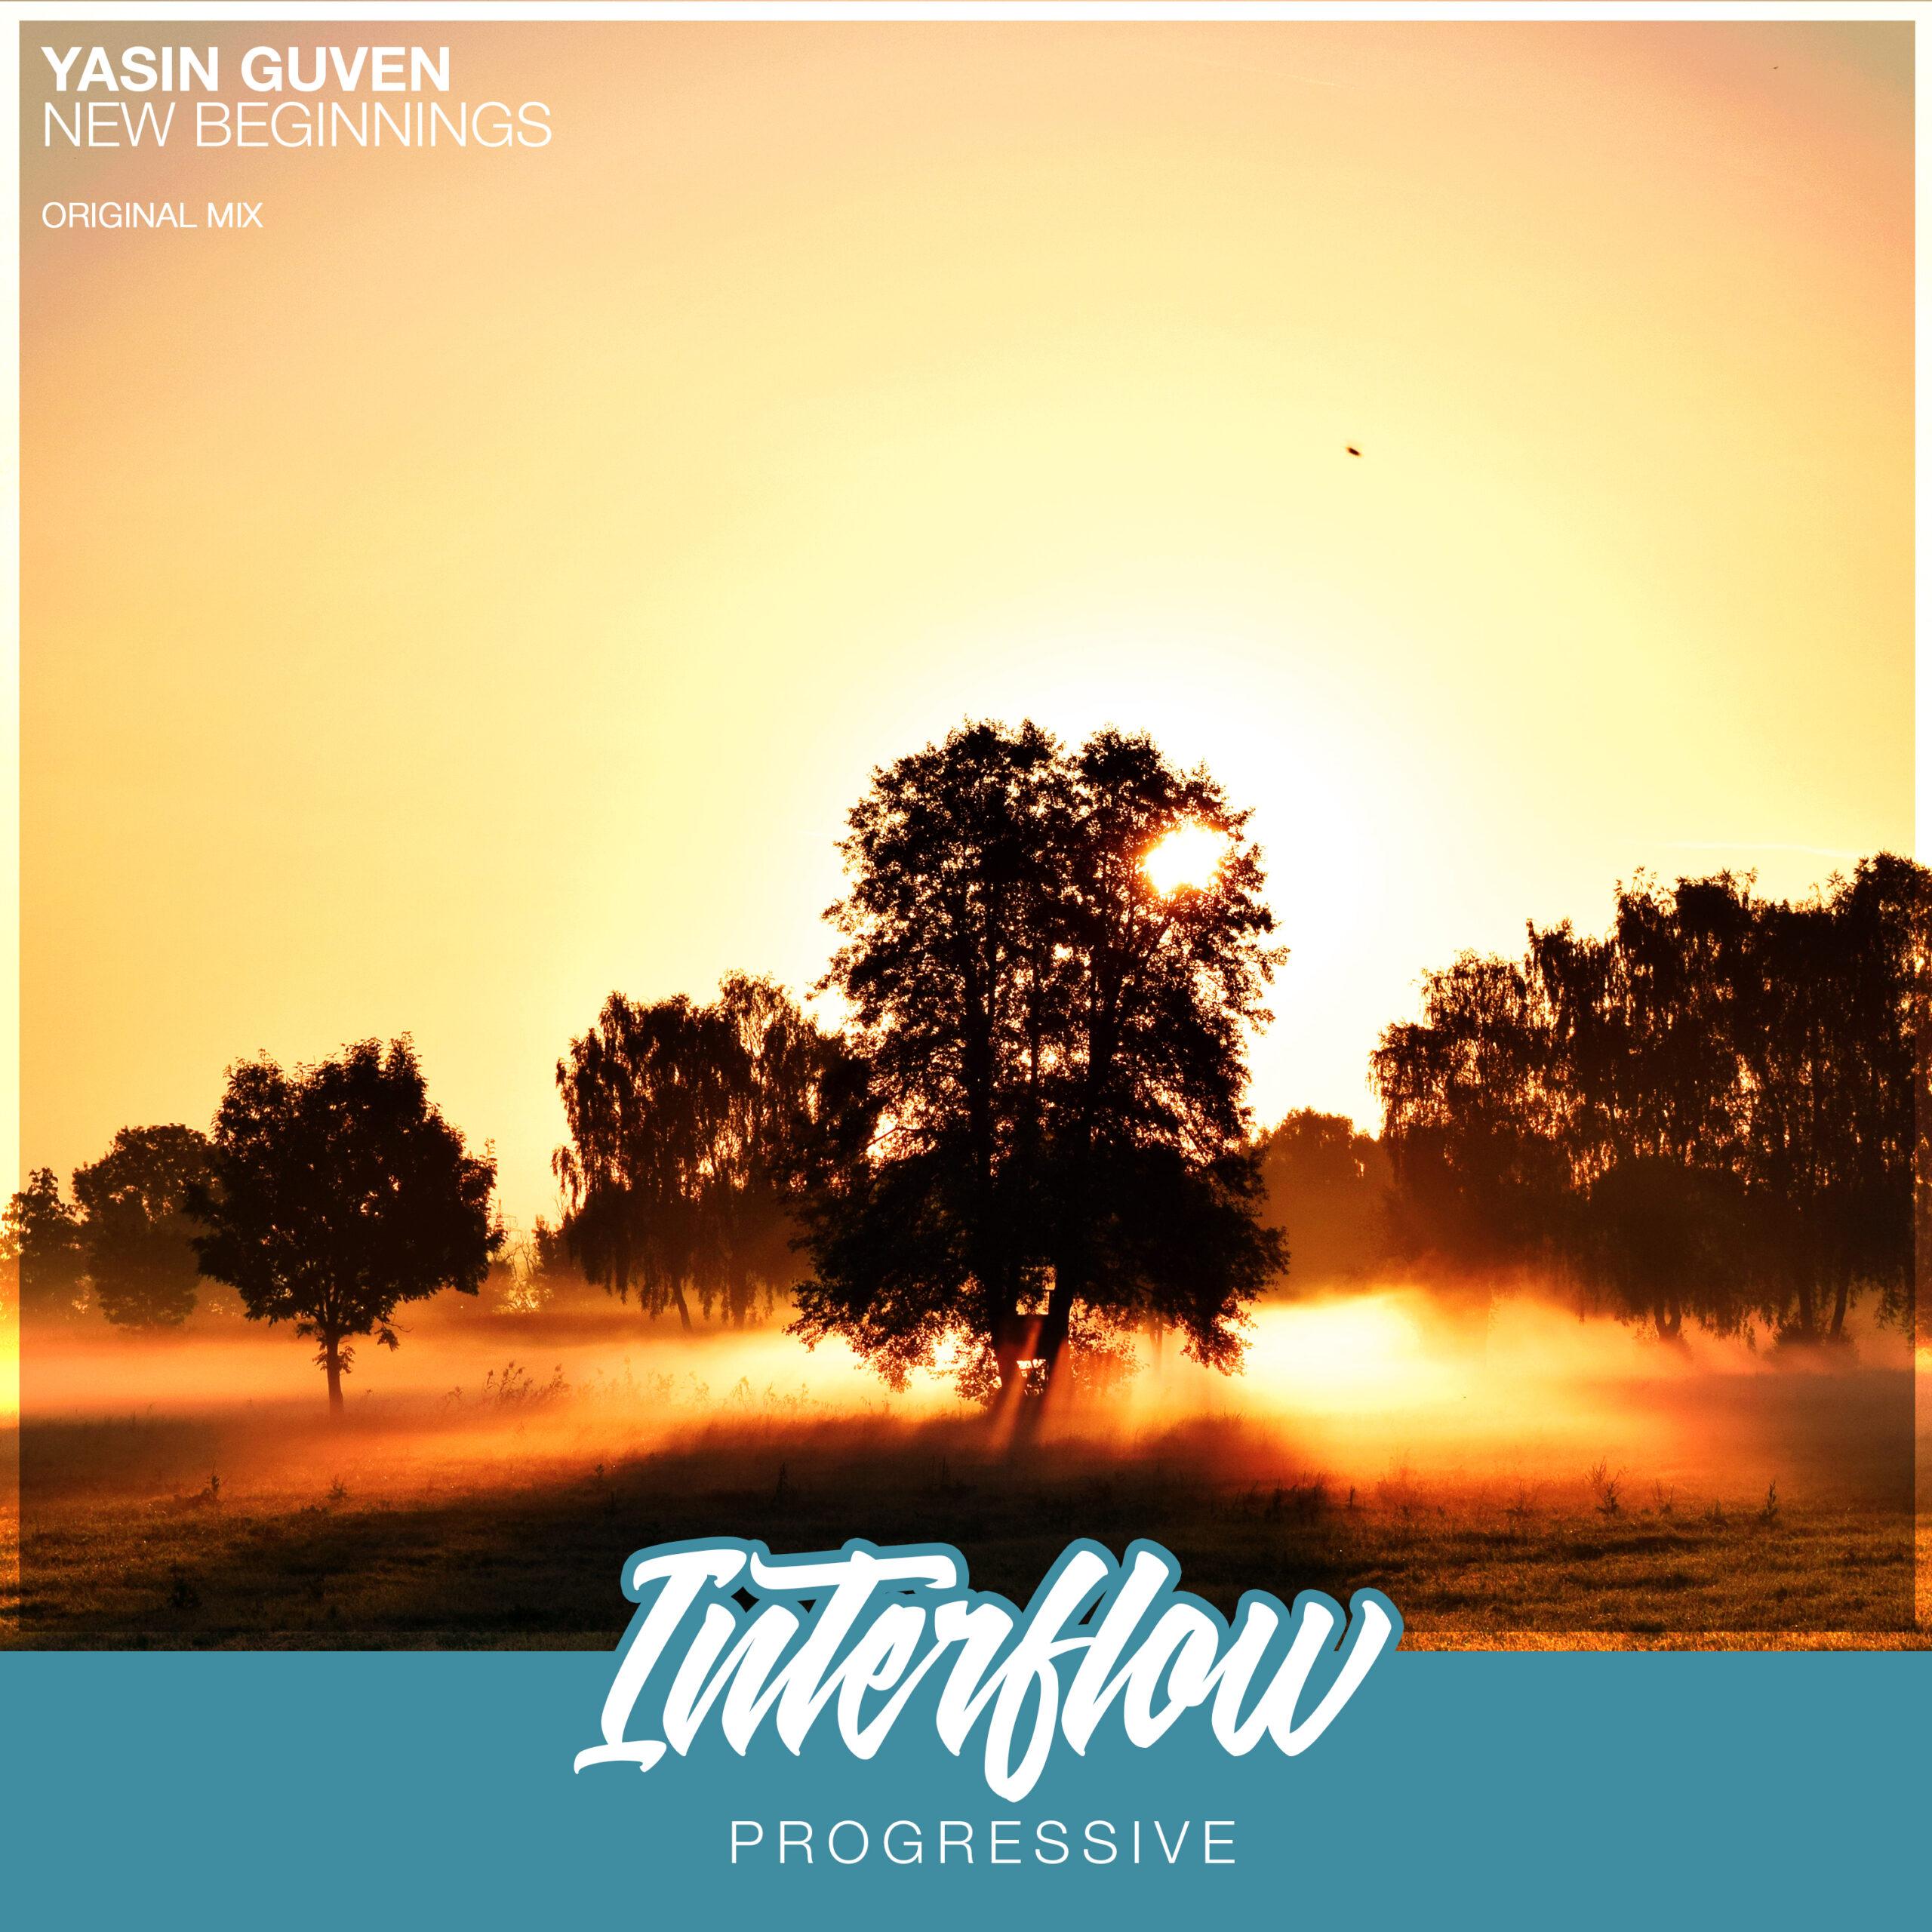 Full of Progressive support Yasin Guven